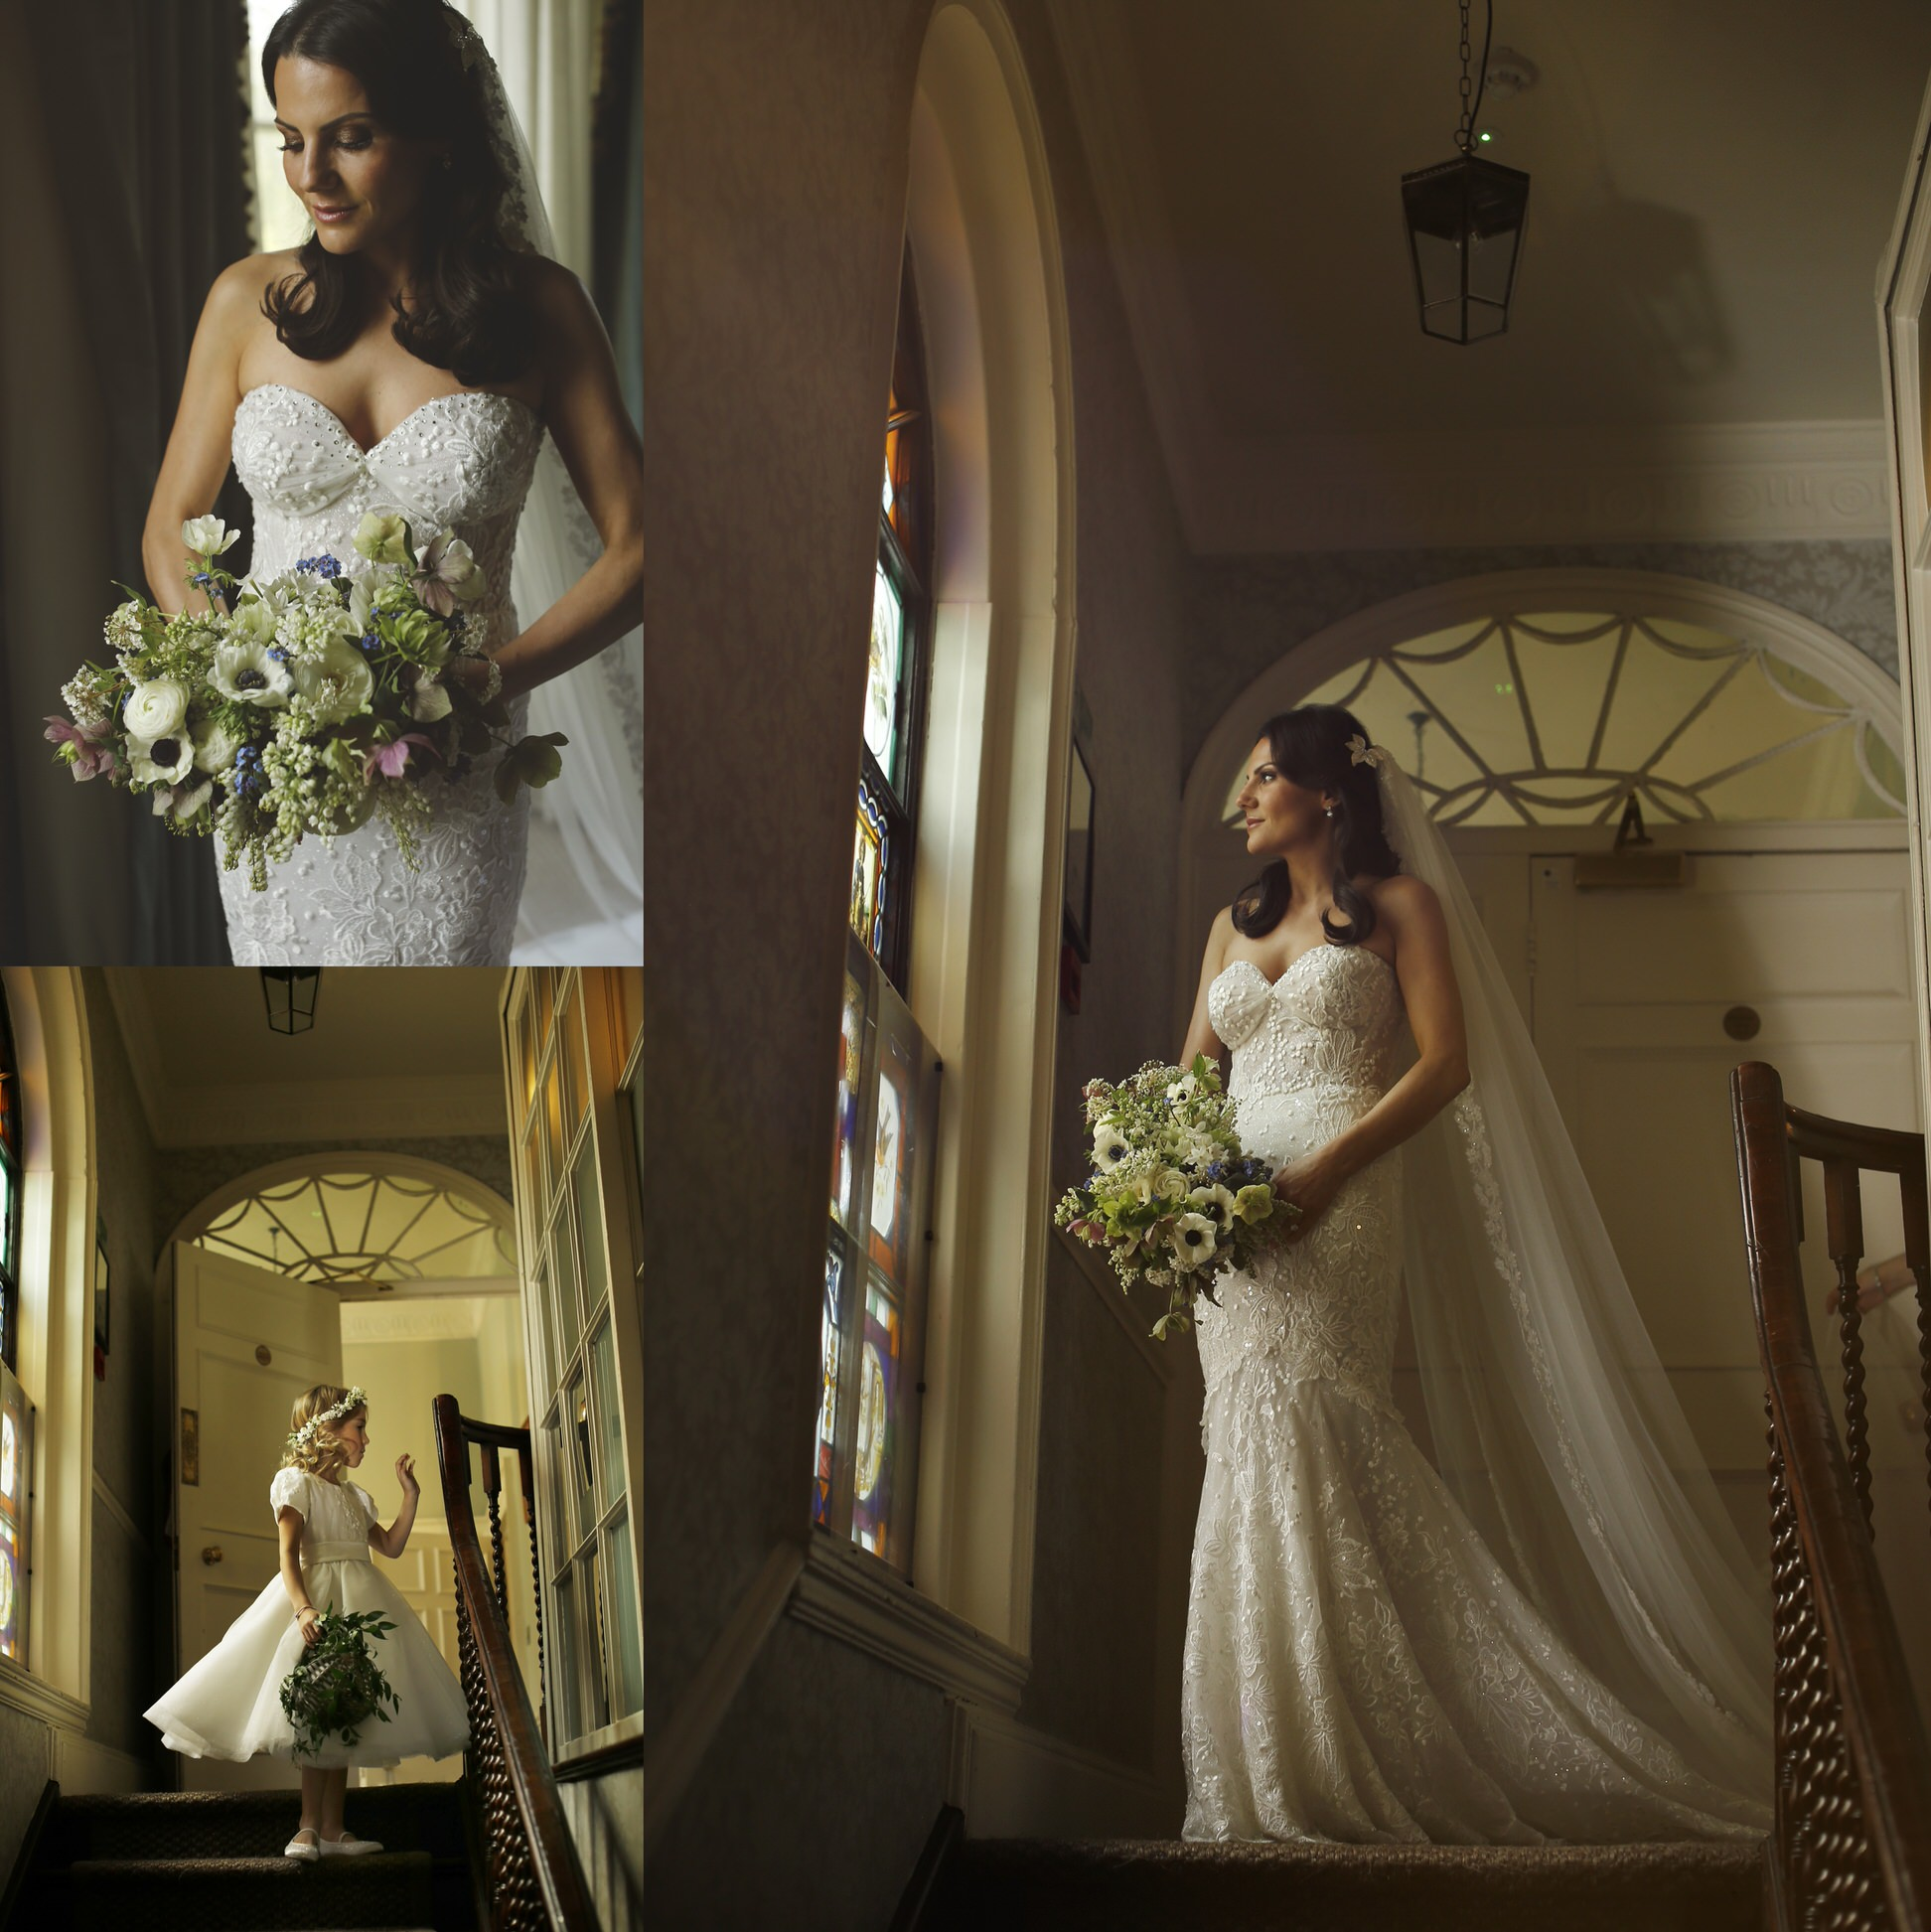 brettharkness-luxury-wedding-photographer-uk_0023.jpg